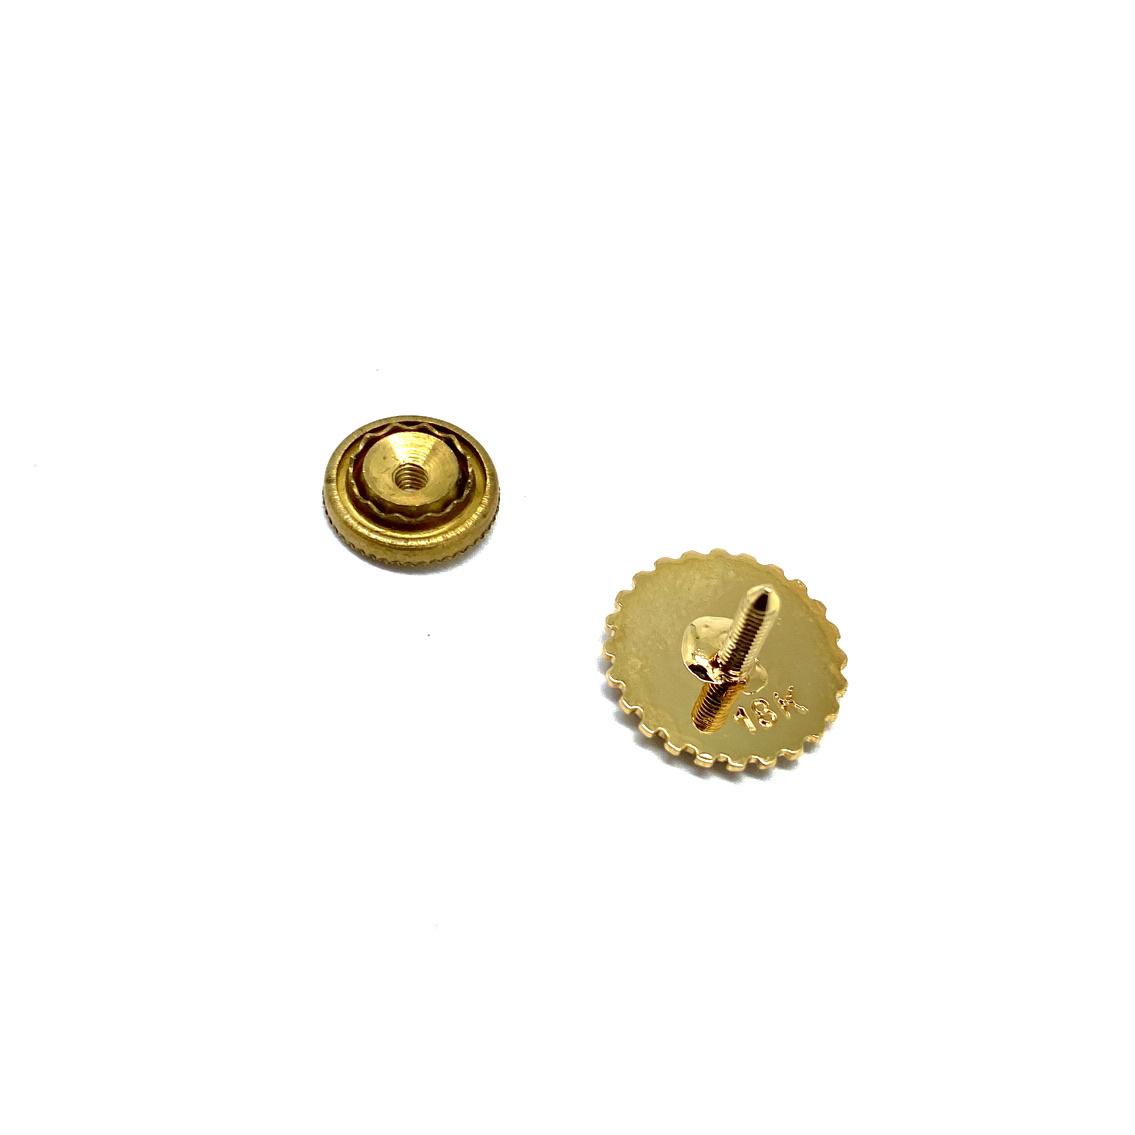 Pin Rotary Past President goud + briljant 0.02 ct